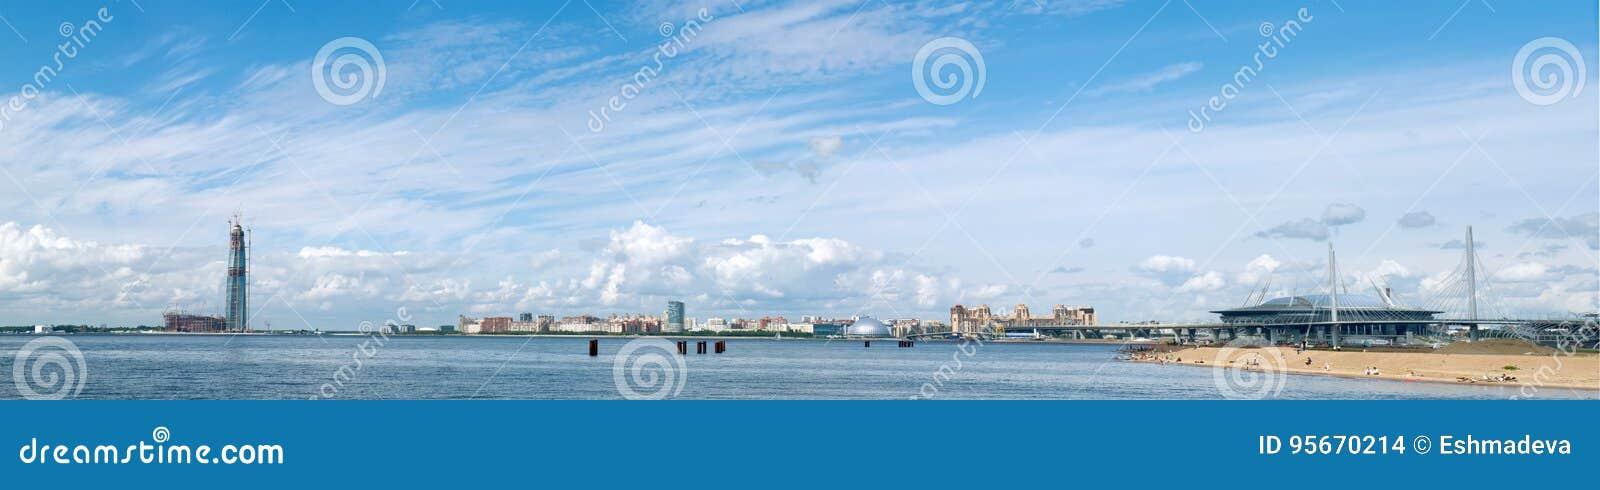 St Petersburg LA RUSSIE - 25 JUIN 2017 Golfe panoramique de Finla